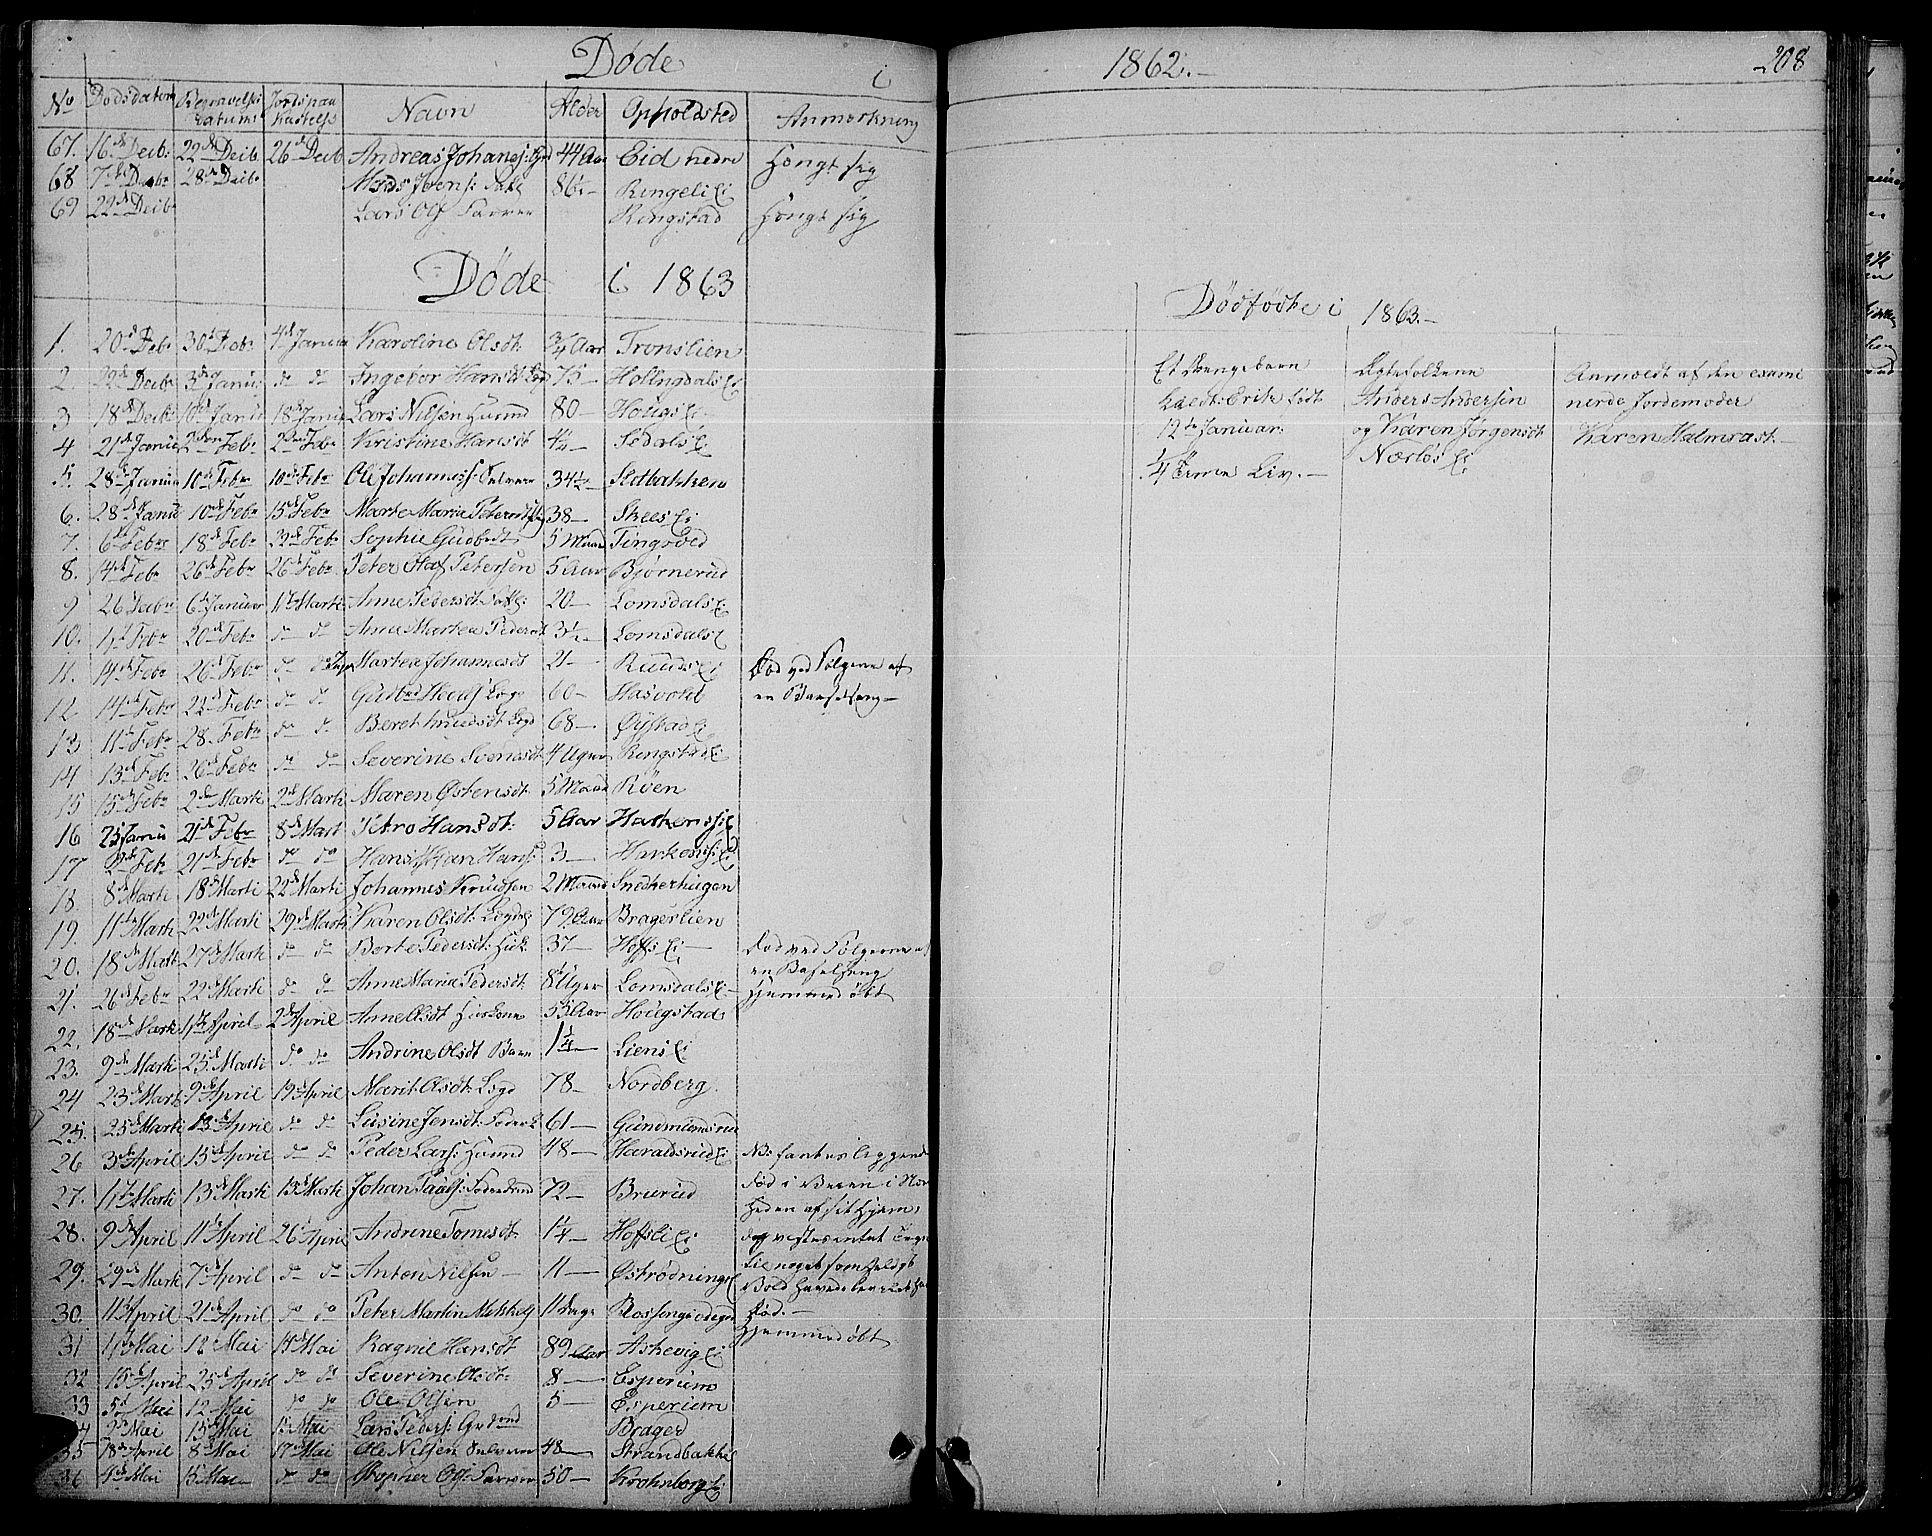 SAH, Søndre Land prestekontor, L/L0001: Klokkerbok nr. 1, 1849-1883, s. 208